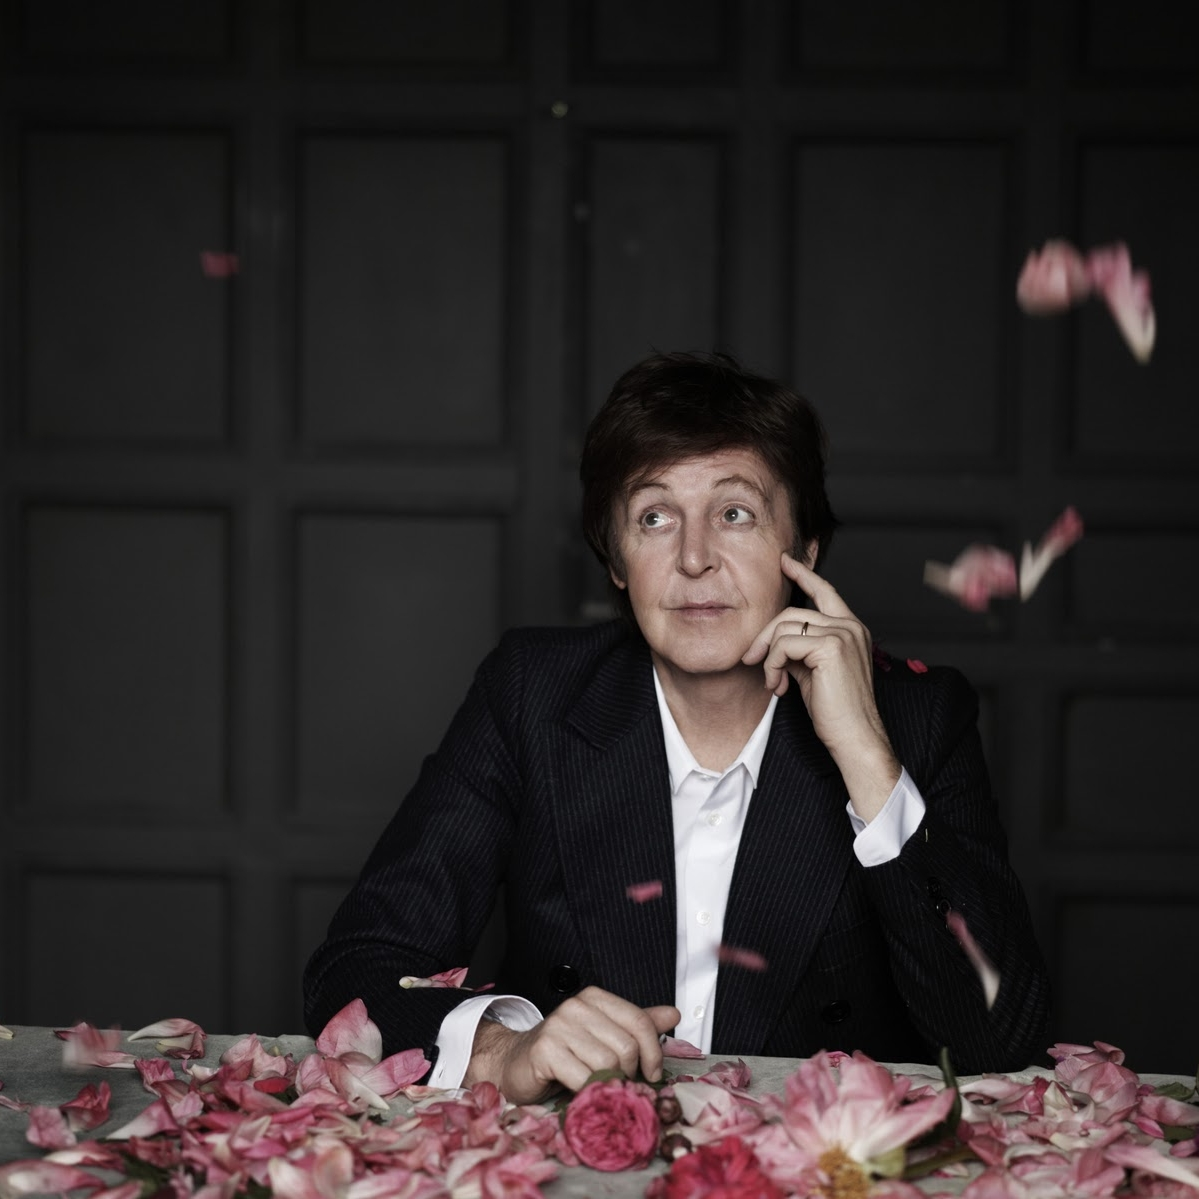 PM_KOTB_GeneralPress_4_cMPL_Communications_Ltd_Photographer_Mary_McCartney.jpg